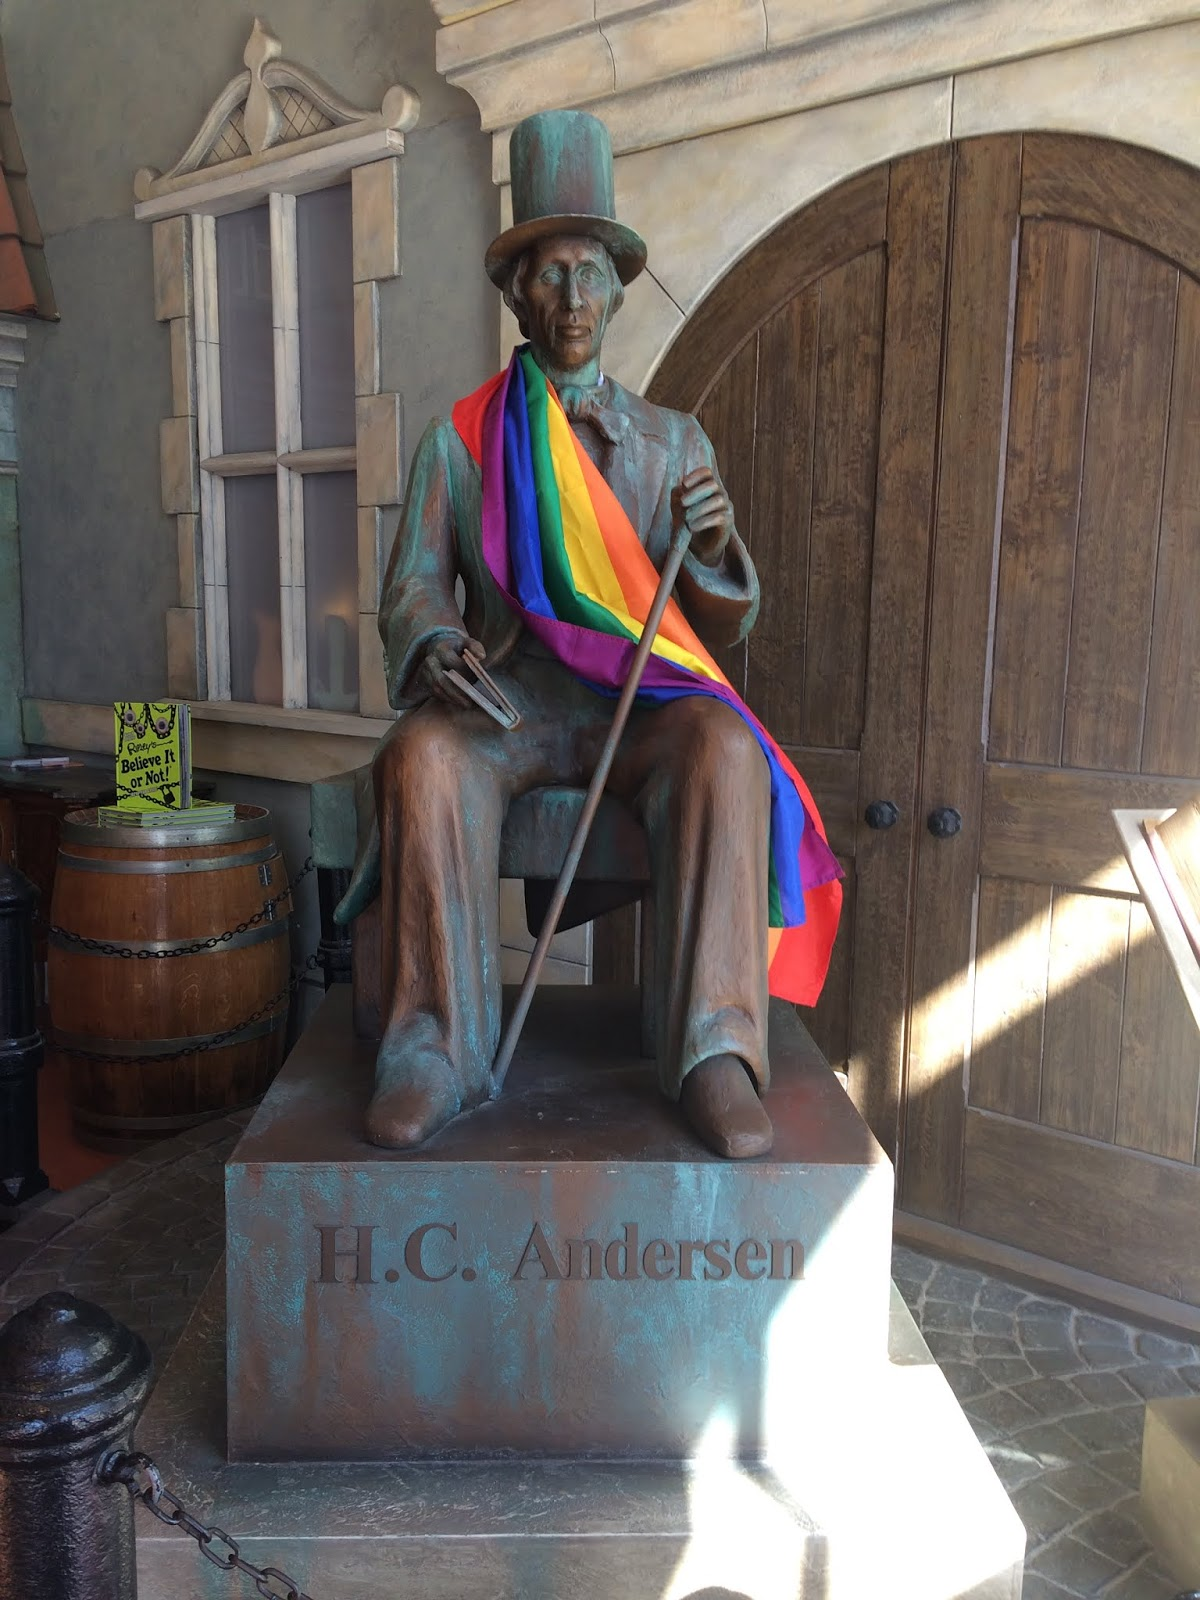 Animatronic statue of Hans Christian Andersen